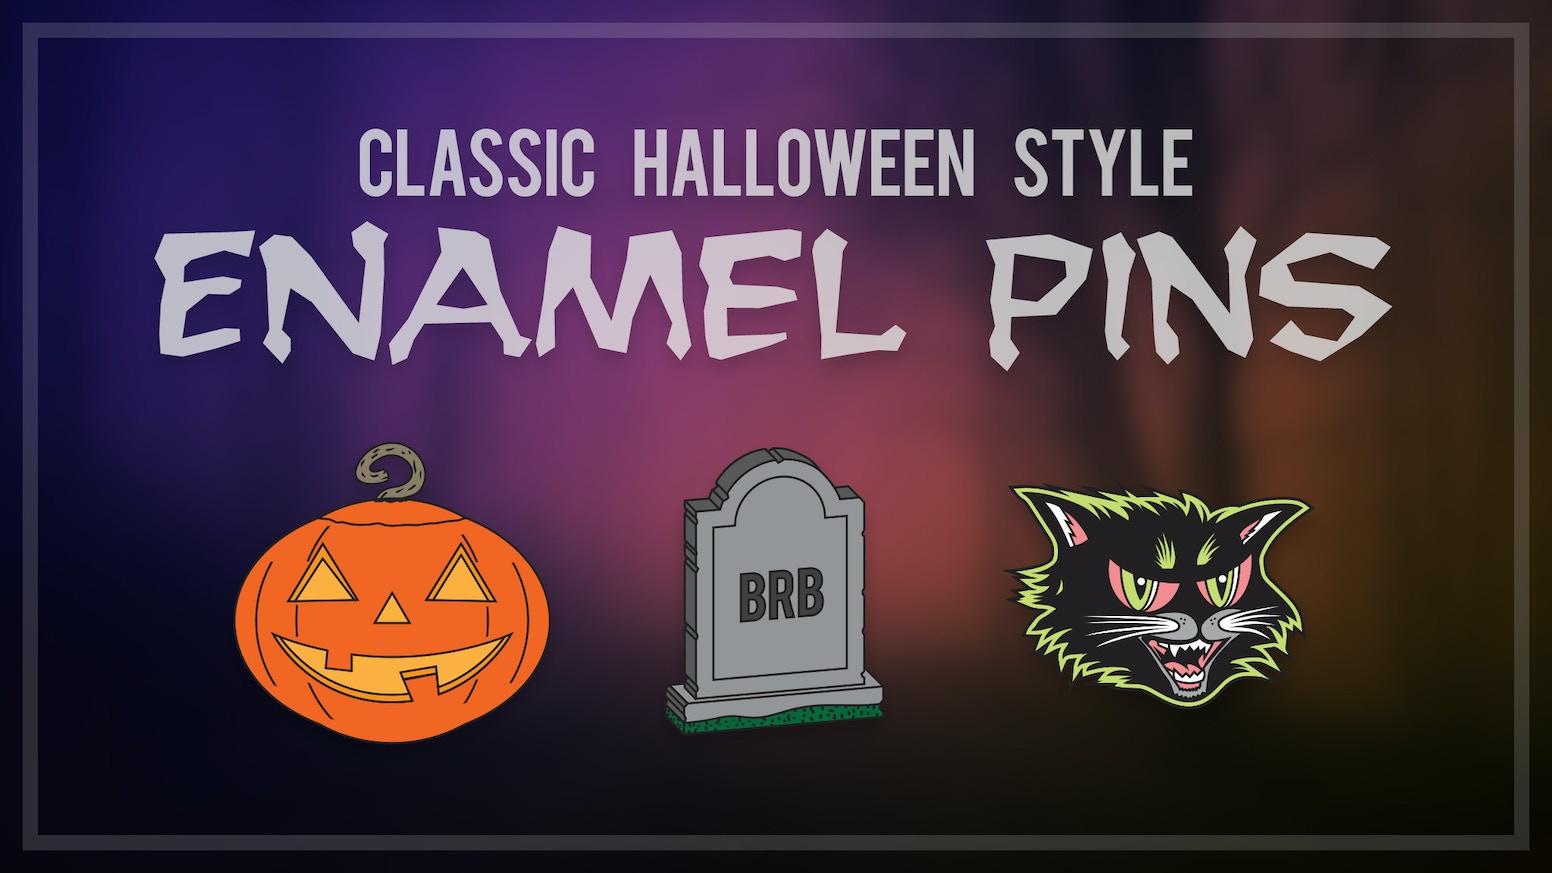 Classic Halloween Style Enamel Pins by Jake Caputo » Elf